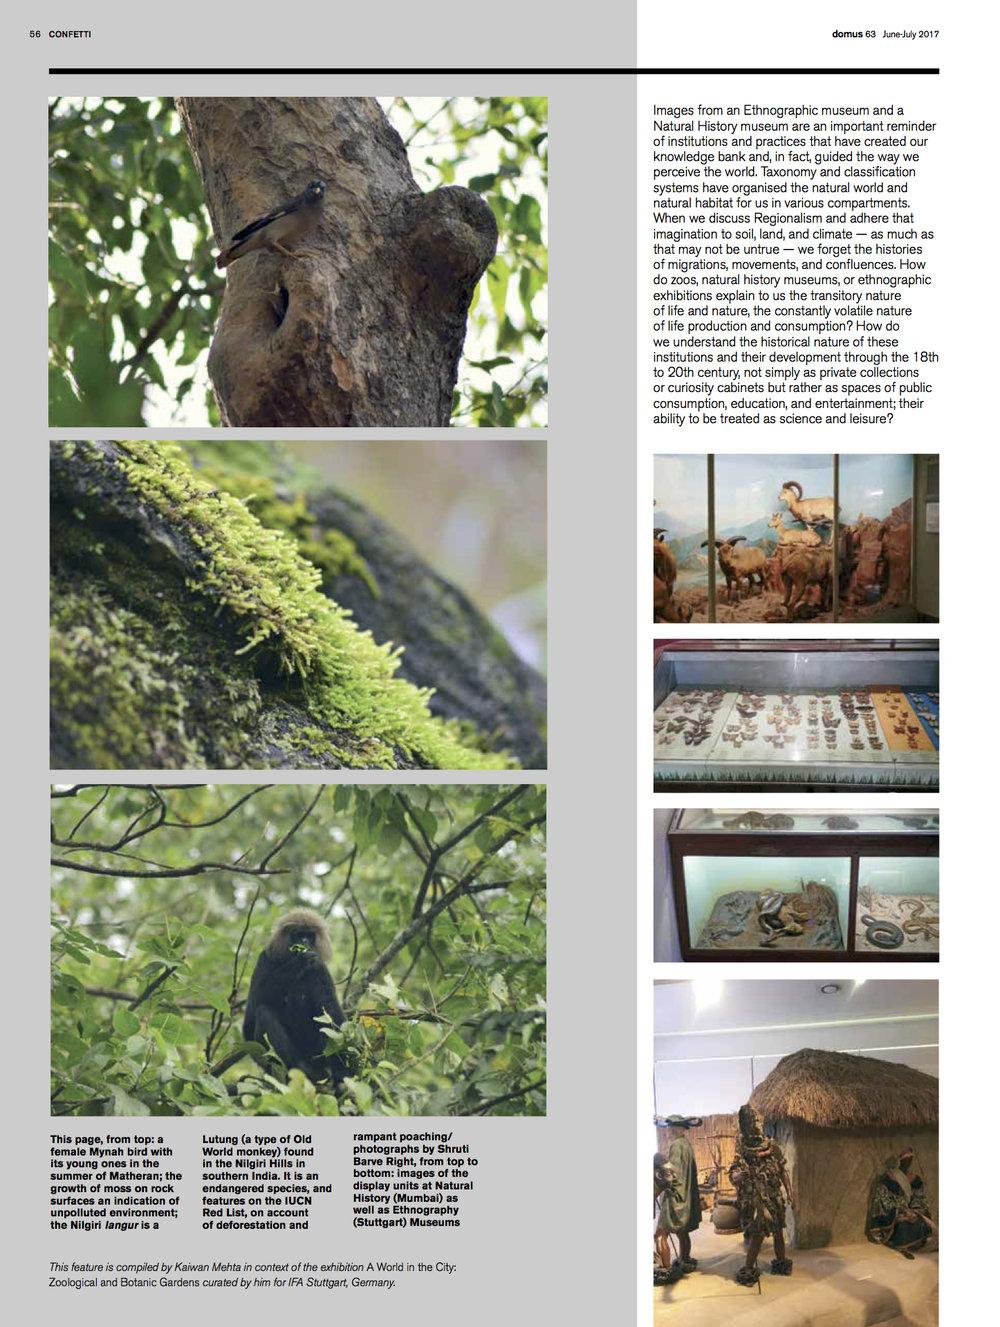 DI_63_Zoo 13.jpg